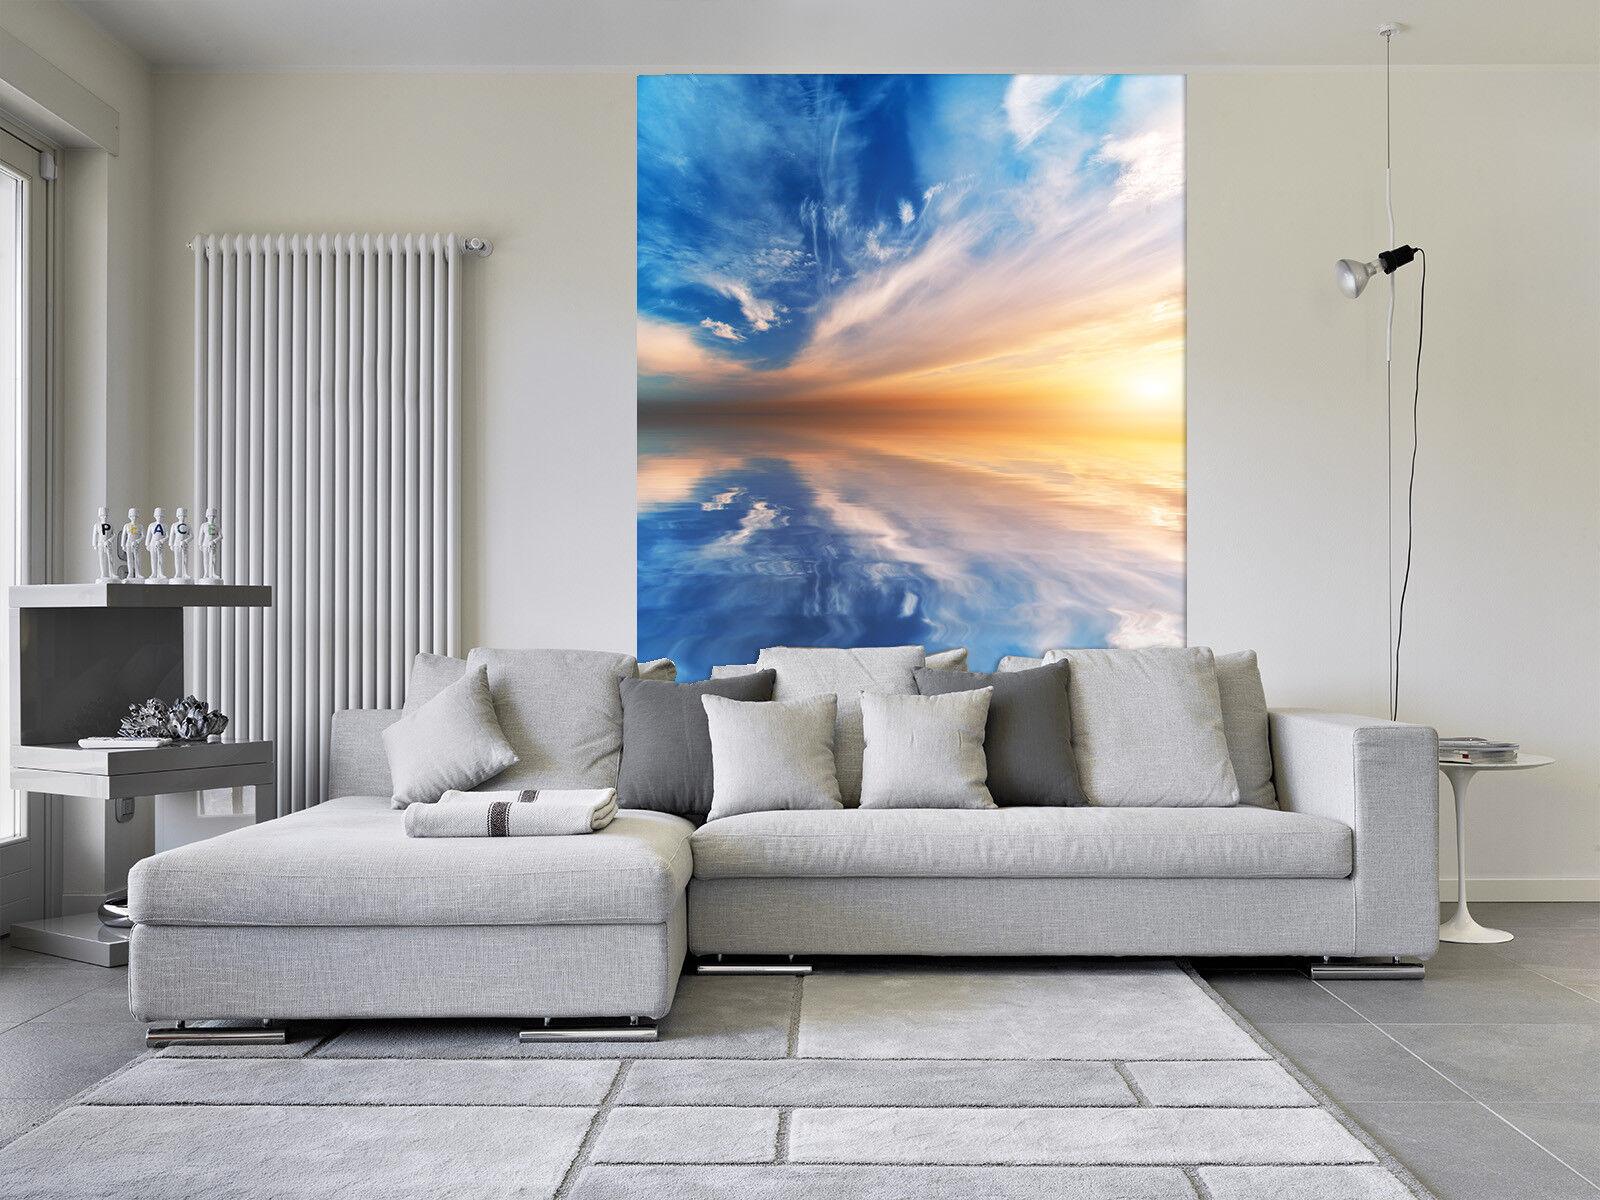 3D Sky Clouds 499 Wallpaper Murals Wall Print Wallpaper Mural AJ WALL AU Kyra